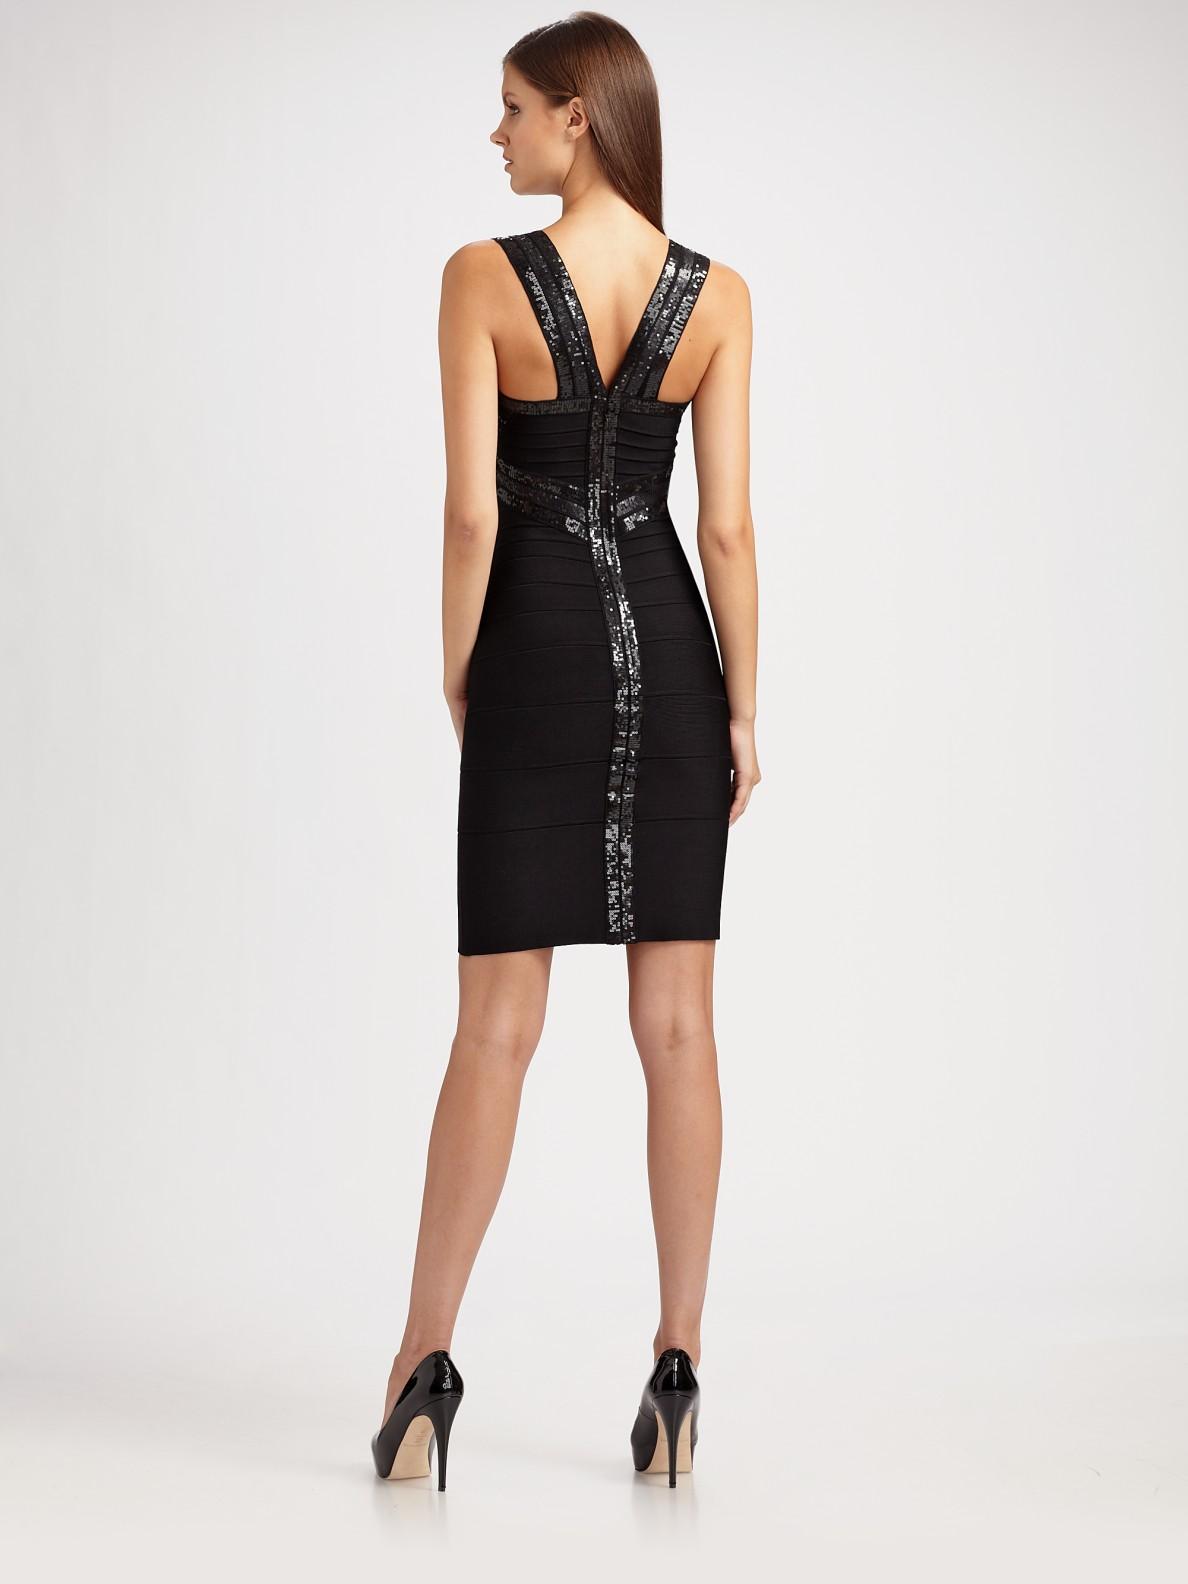 Herv 233 L 233 Ger Criss Cross Sequined Bandage Dress In Black Lyst